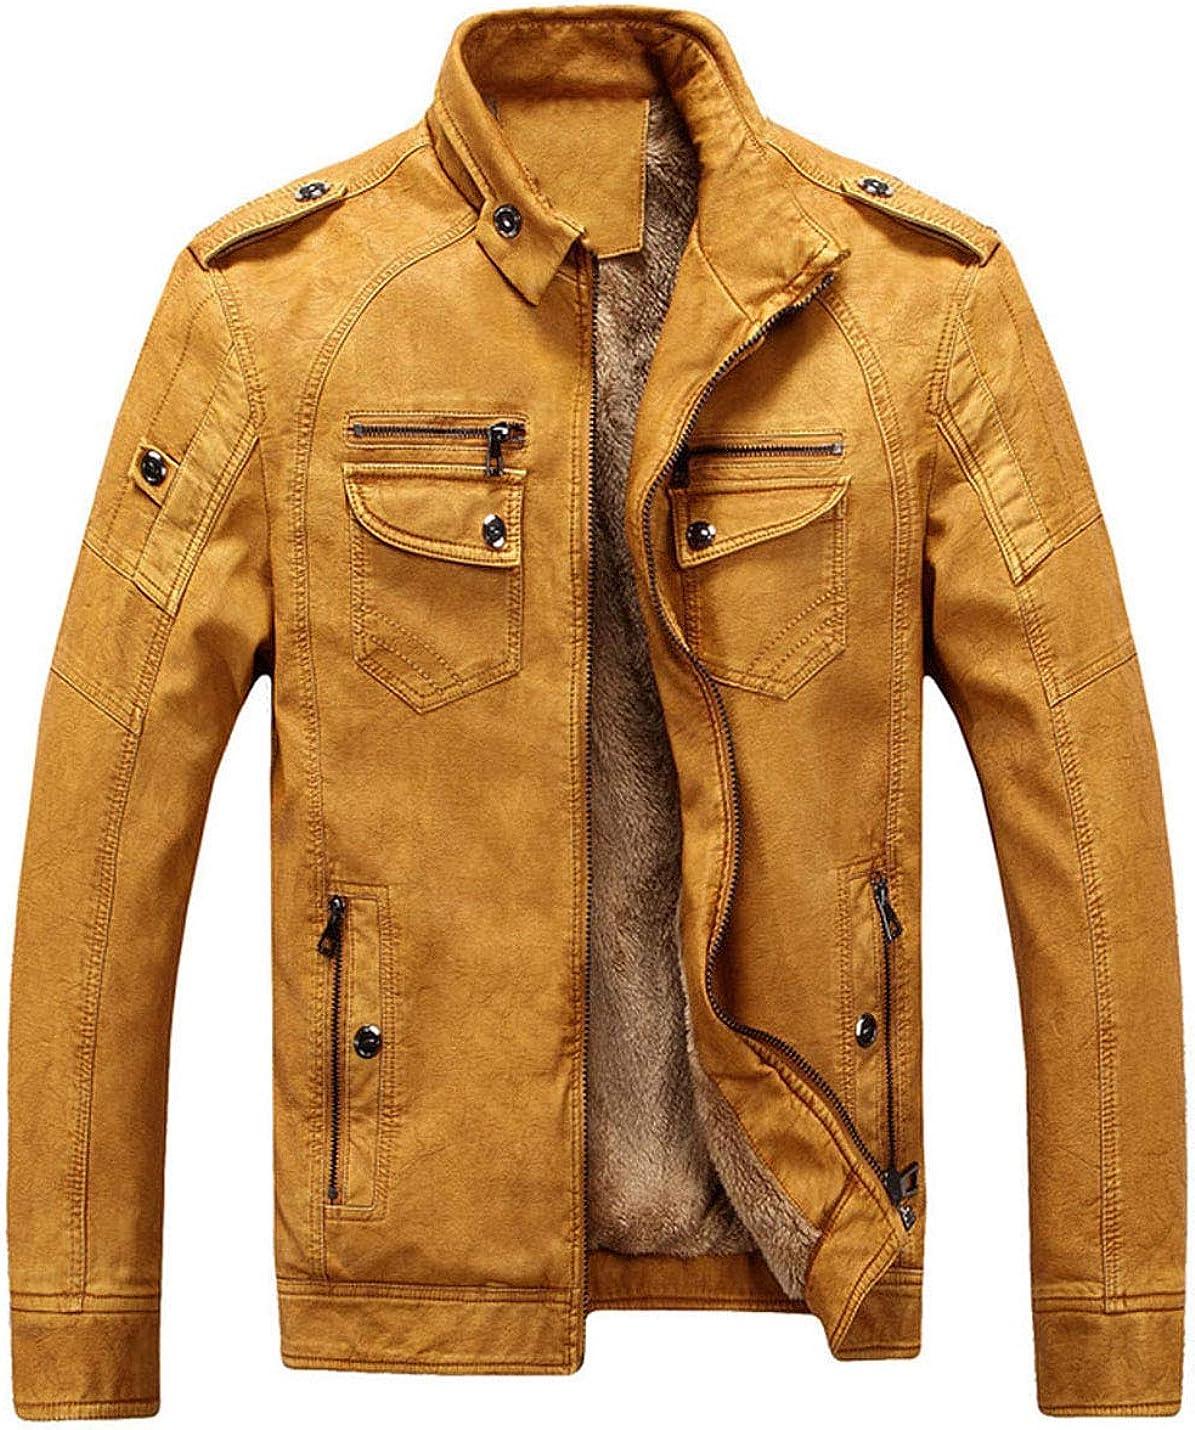 Omoone Men's Slim Warm Thick Fleece PU Leather Trucker Jacket Outwear Coats